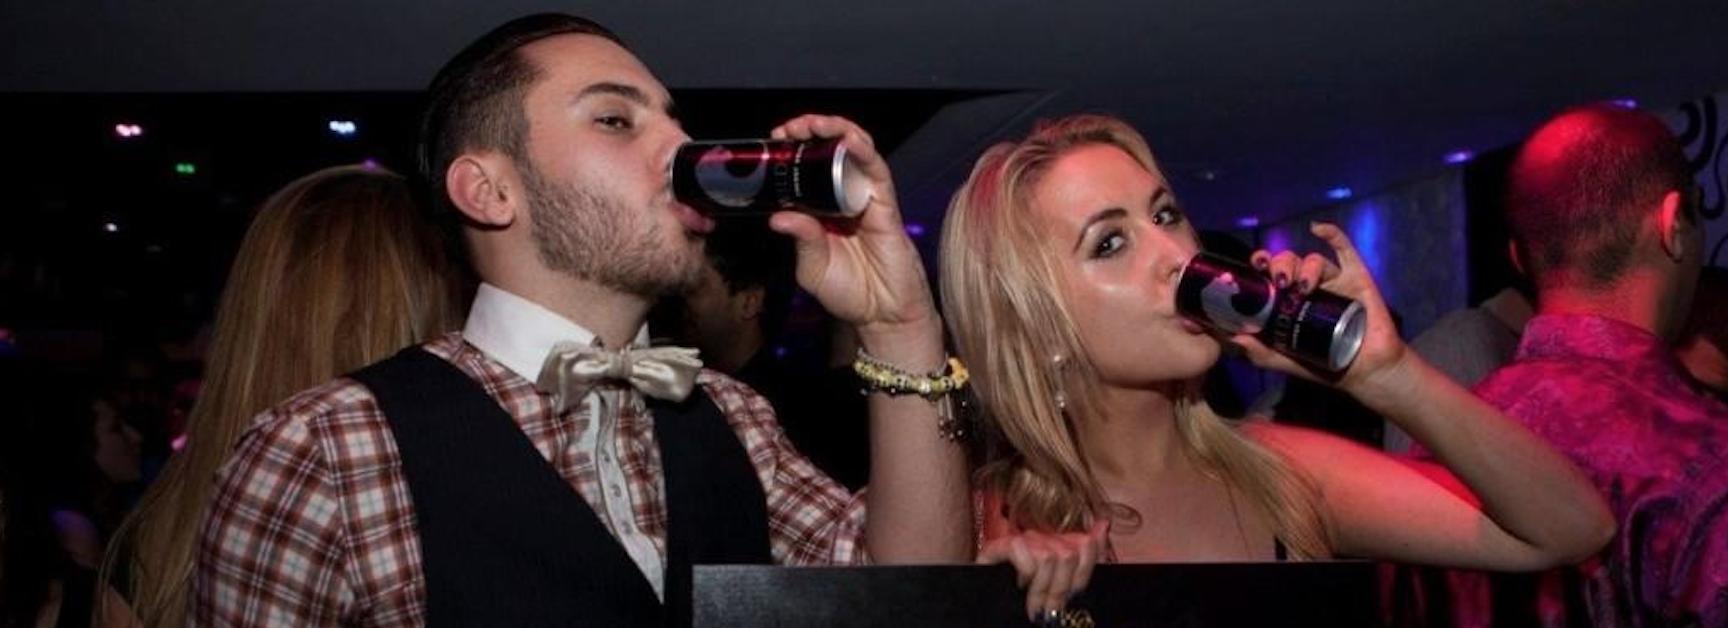 Britain is the 'binge-drinking capital of Europe - Wildcat ...